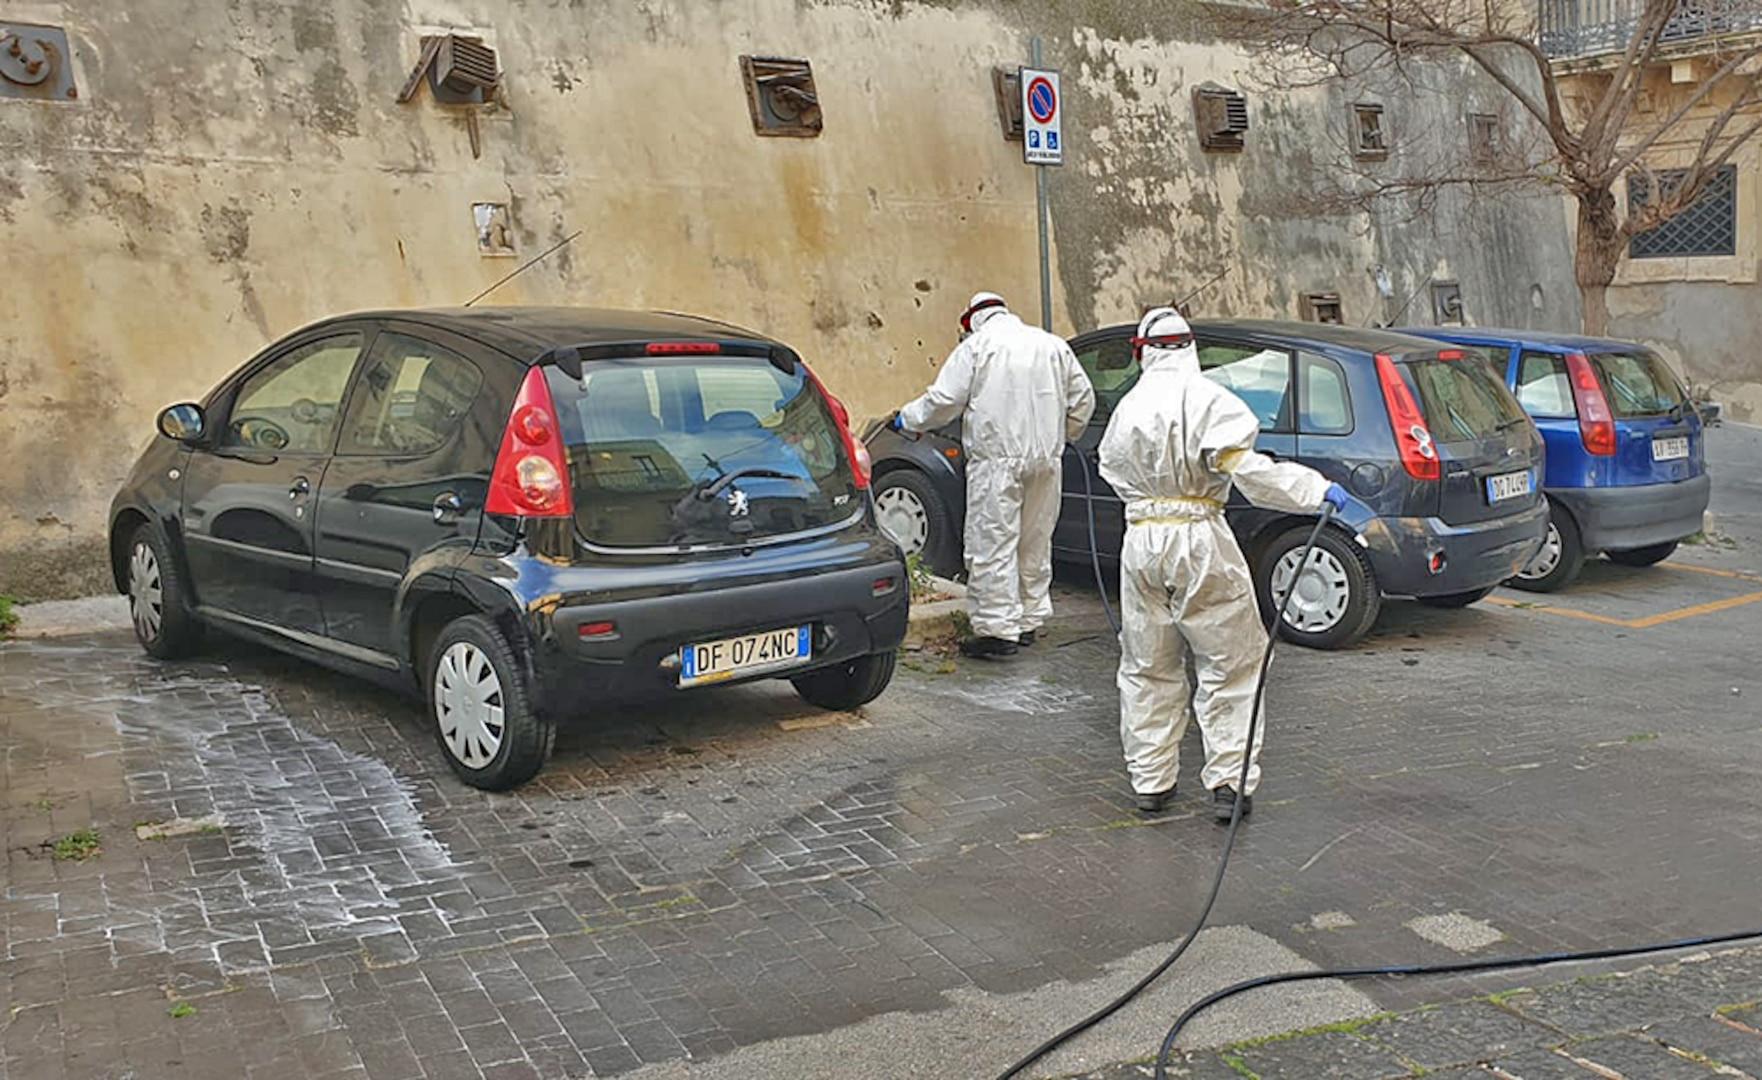 Volunteers in hazmat suits spray down cars in Sicily.